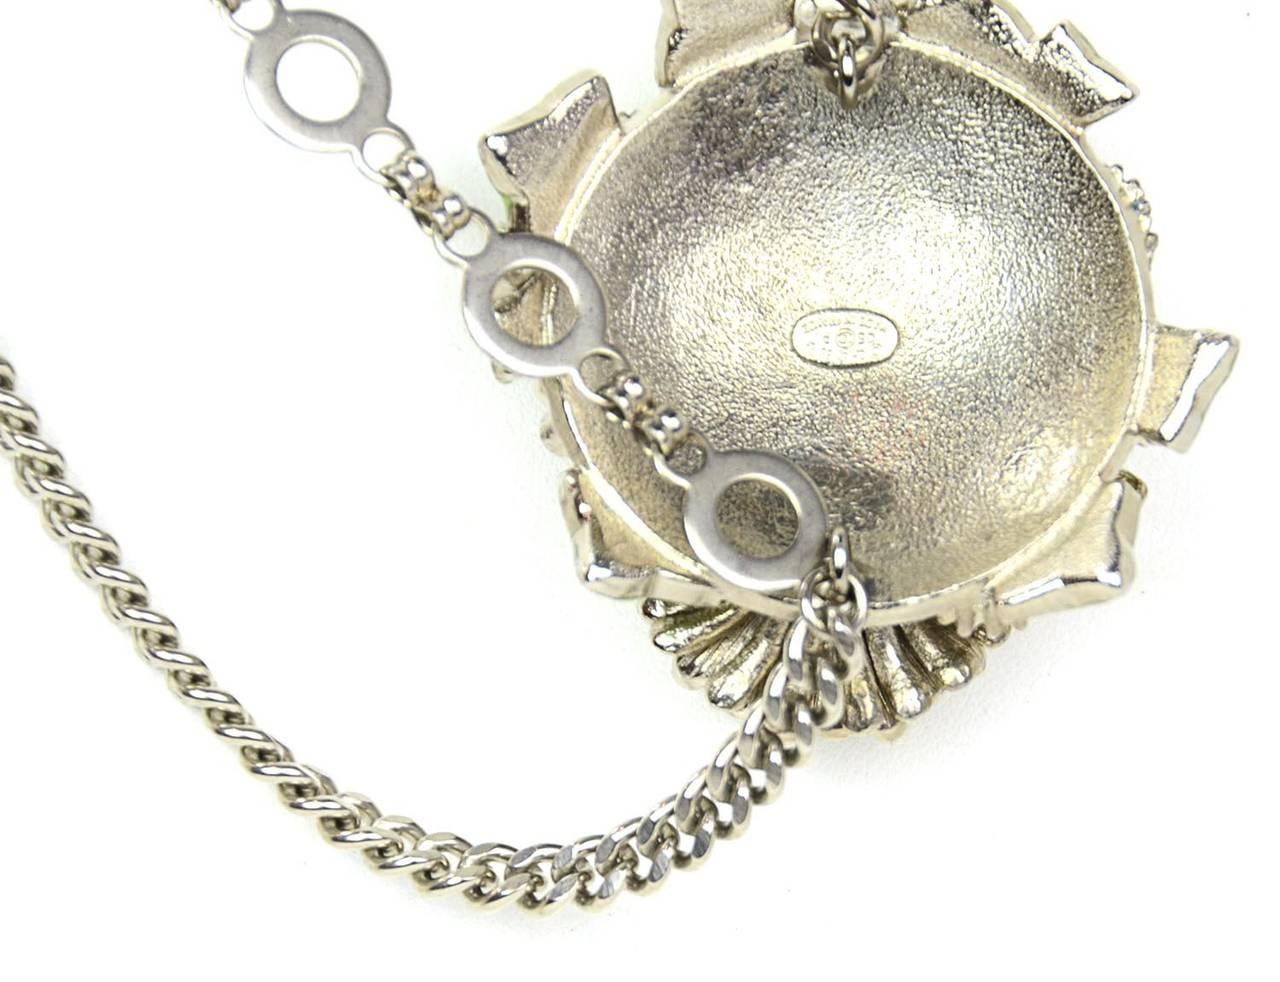 Chanel 2005 Silver Chain Link Belt/Necklace w/Flower & CC Pendants 4